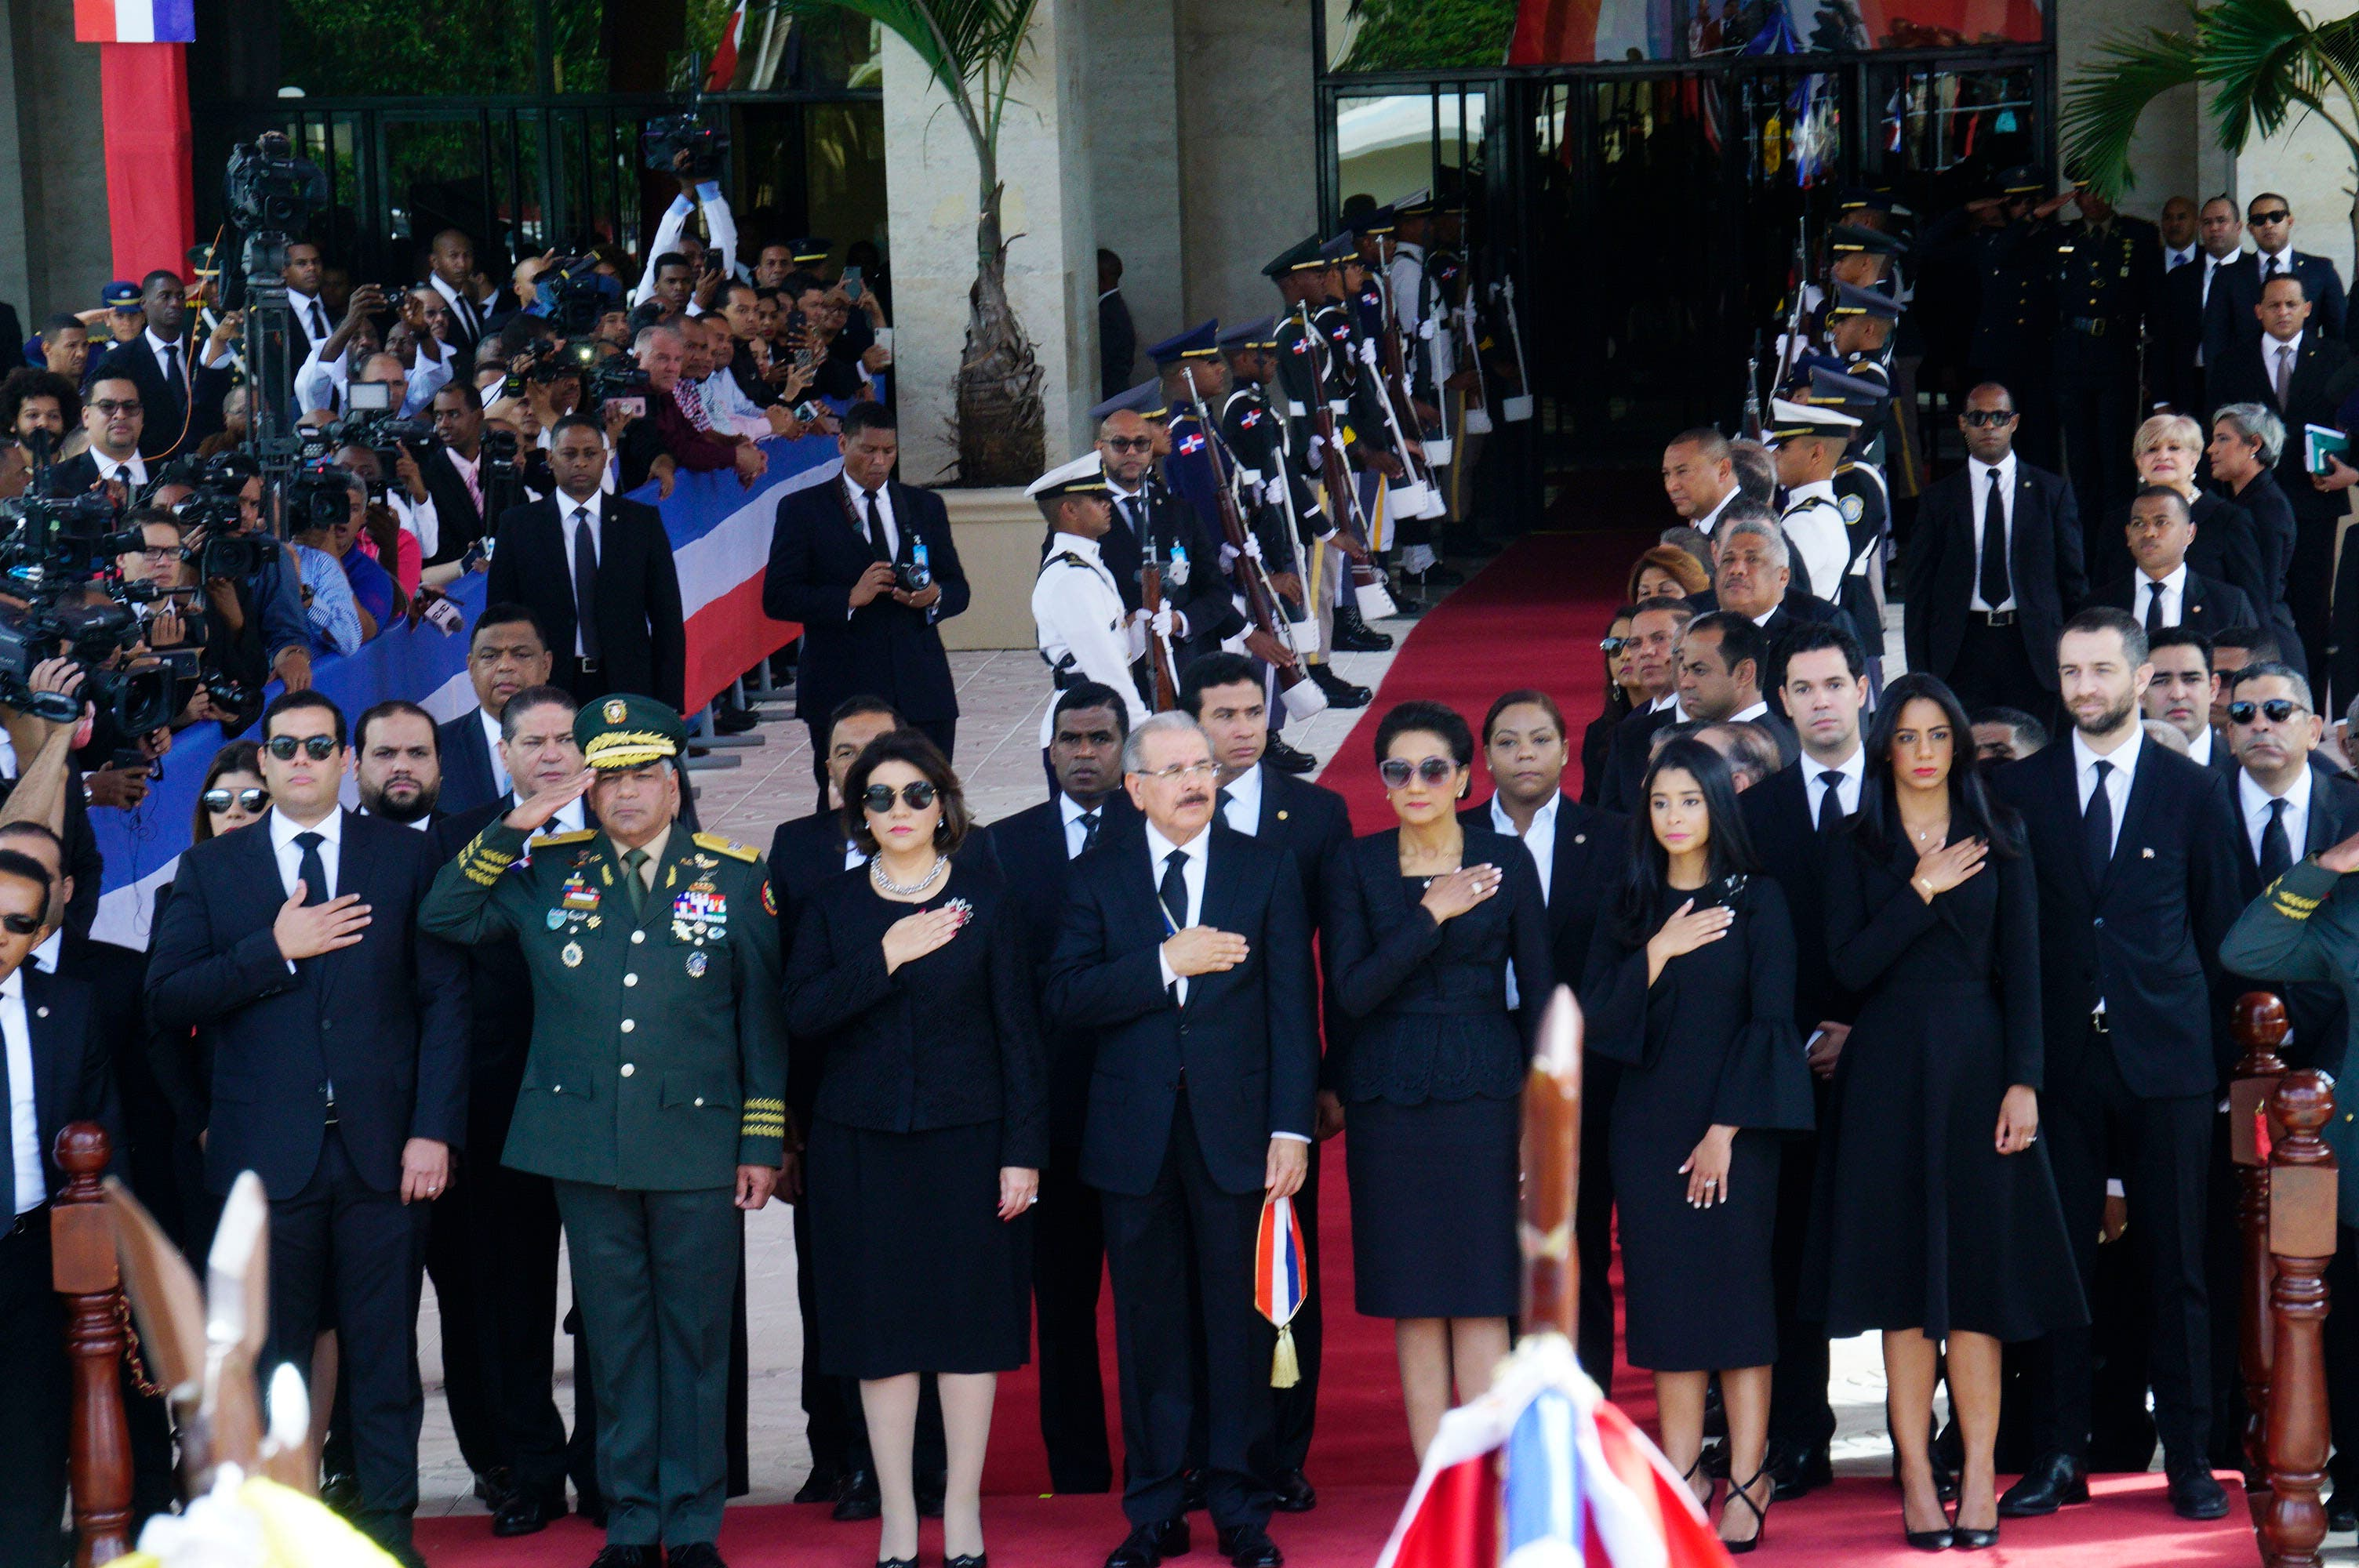 1. El presidente Danilo Medina  recibe honores militares. Foto: Elieser Tapia.